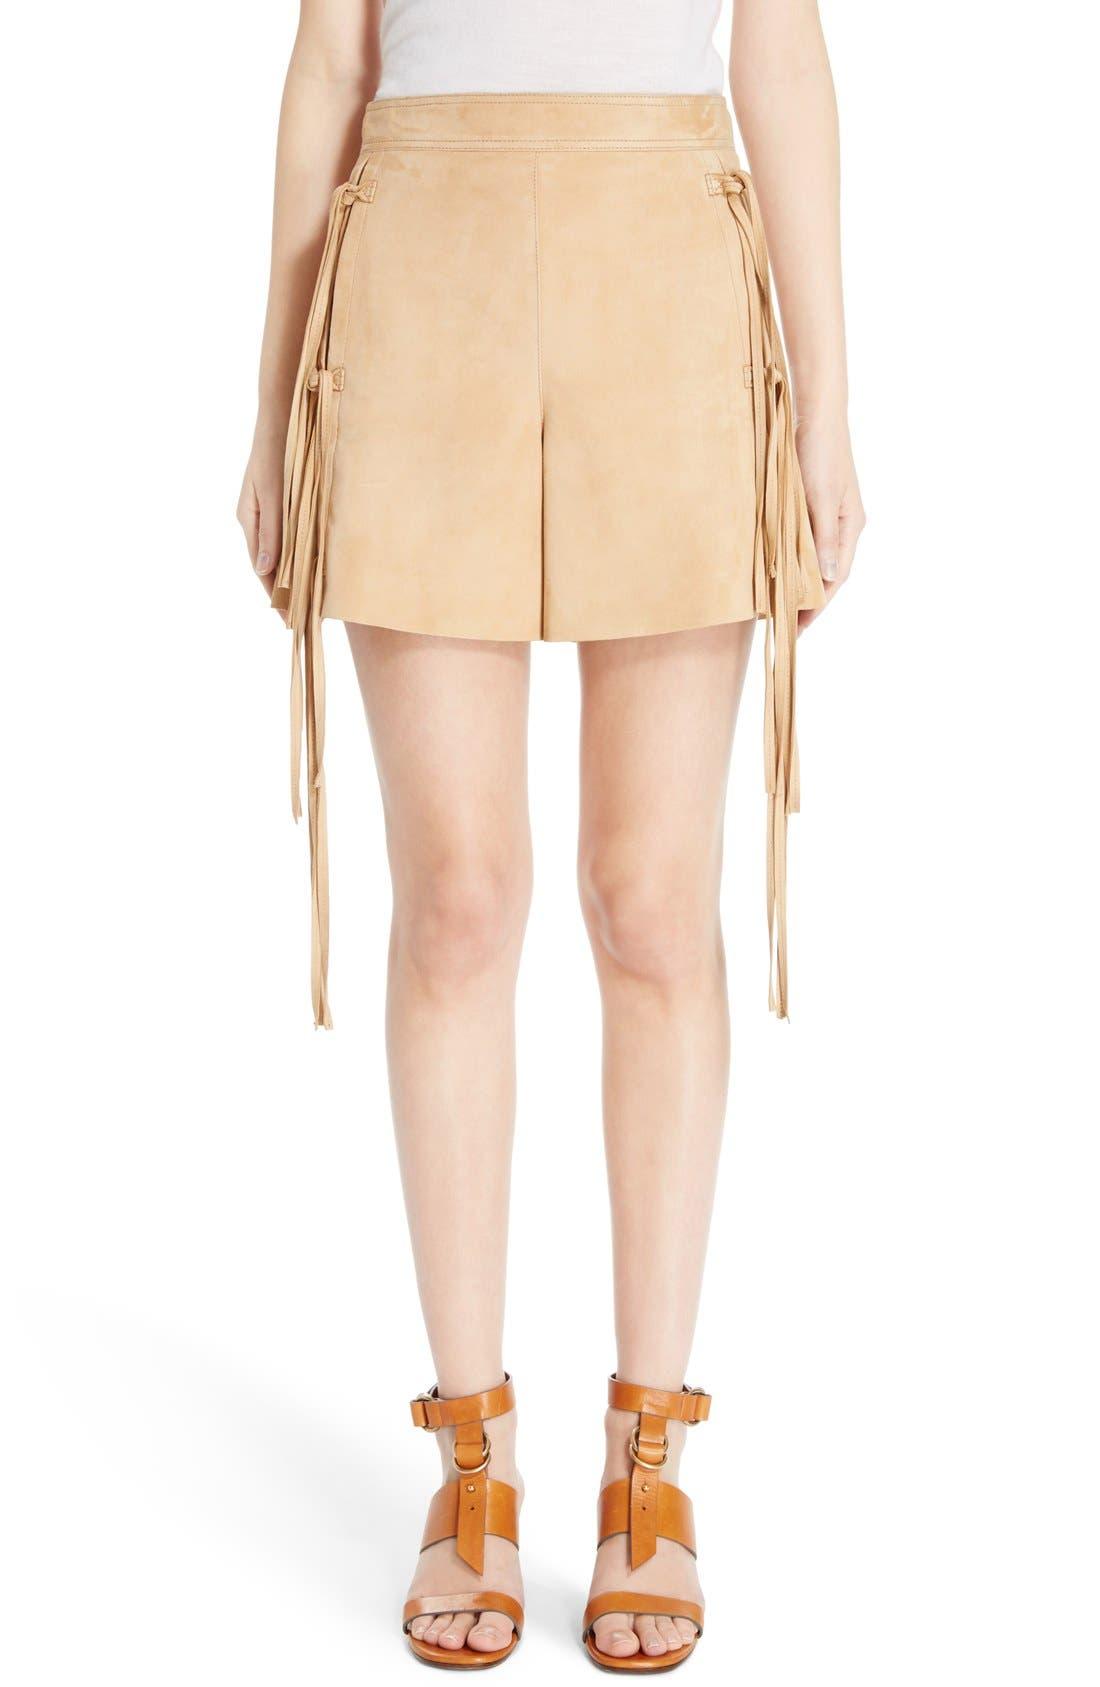 CHLOÉ Fringe Trim Suede Shorts